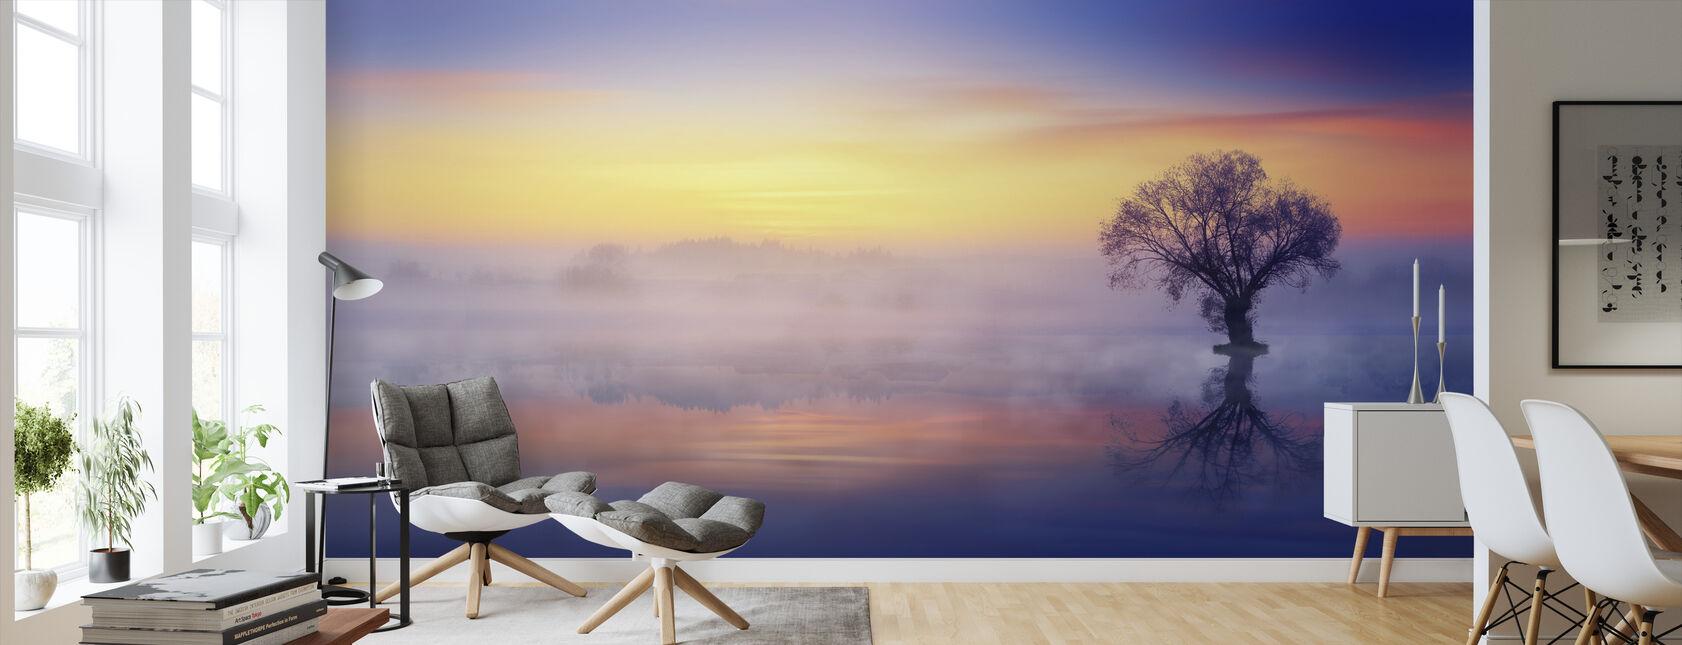 Lonely Tree - Wallpaper - Living Room